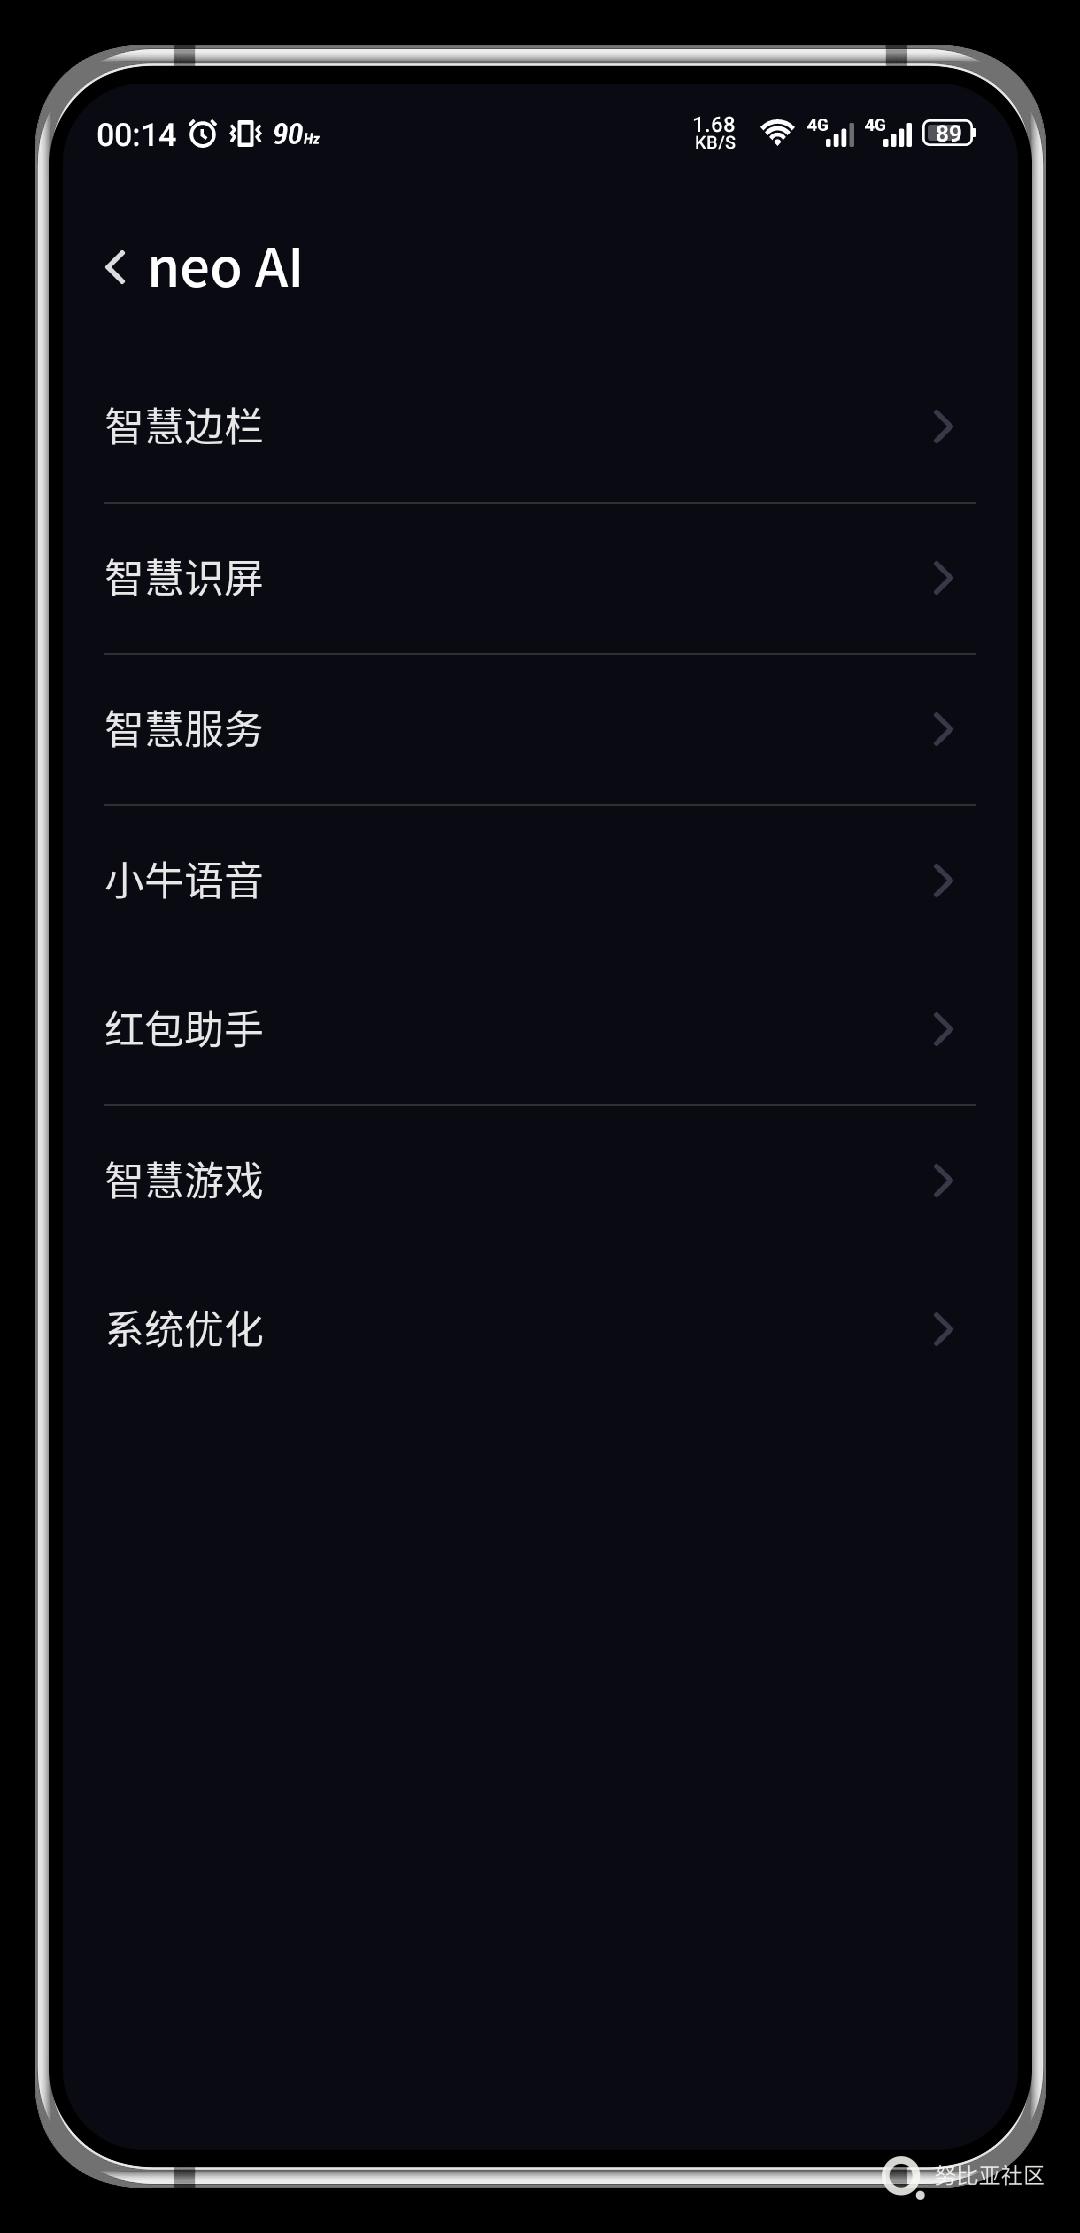 Screenshot_2020-04-20-00-14-27-315.png